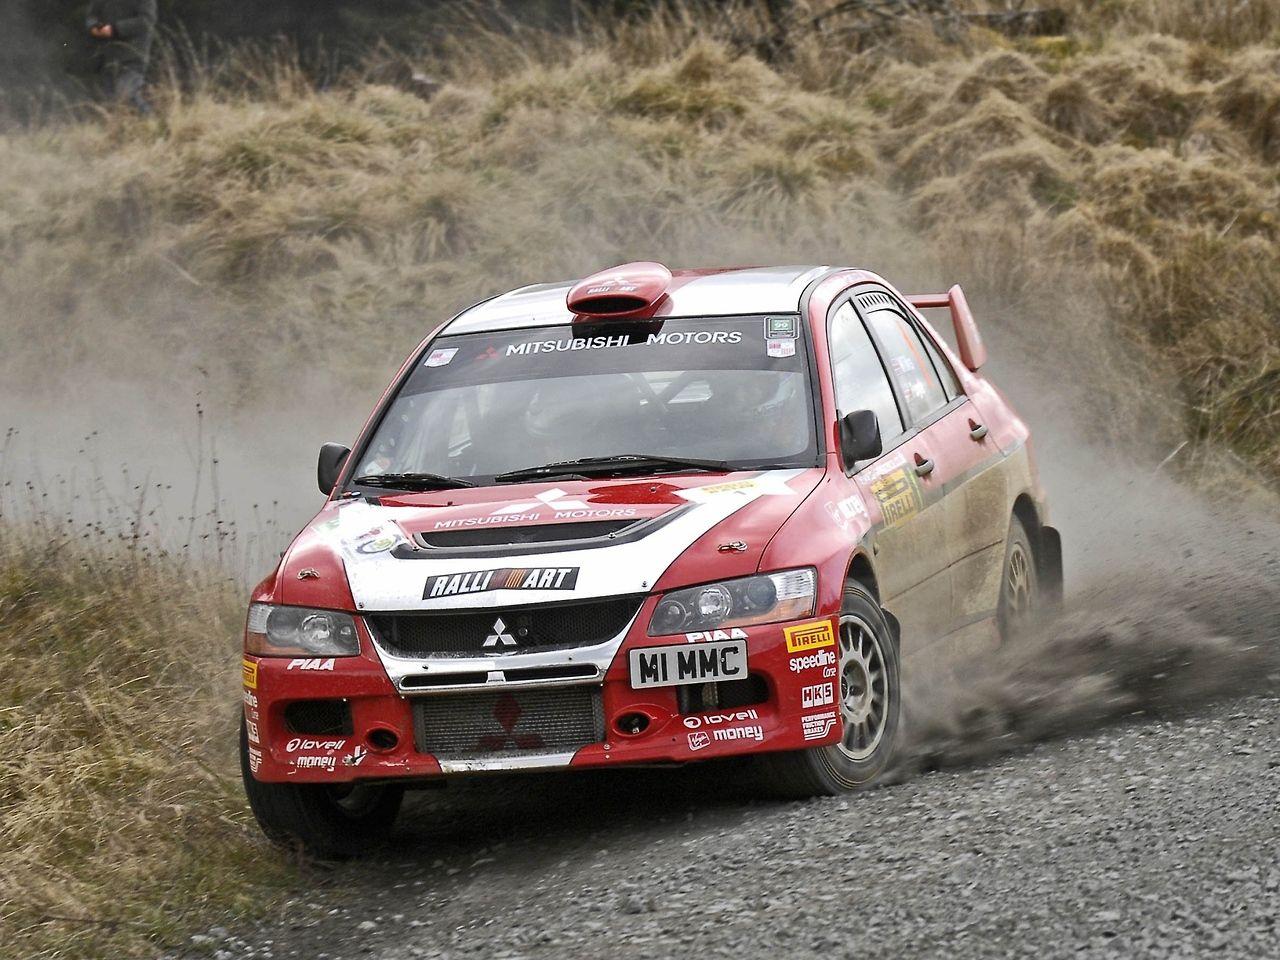 Mitsubishi Evo Rally Car Auto Mitsubishi Pinterest Auta A